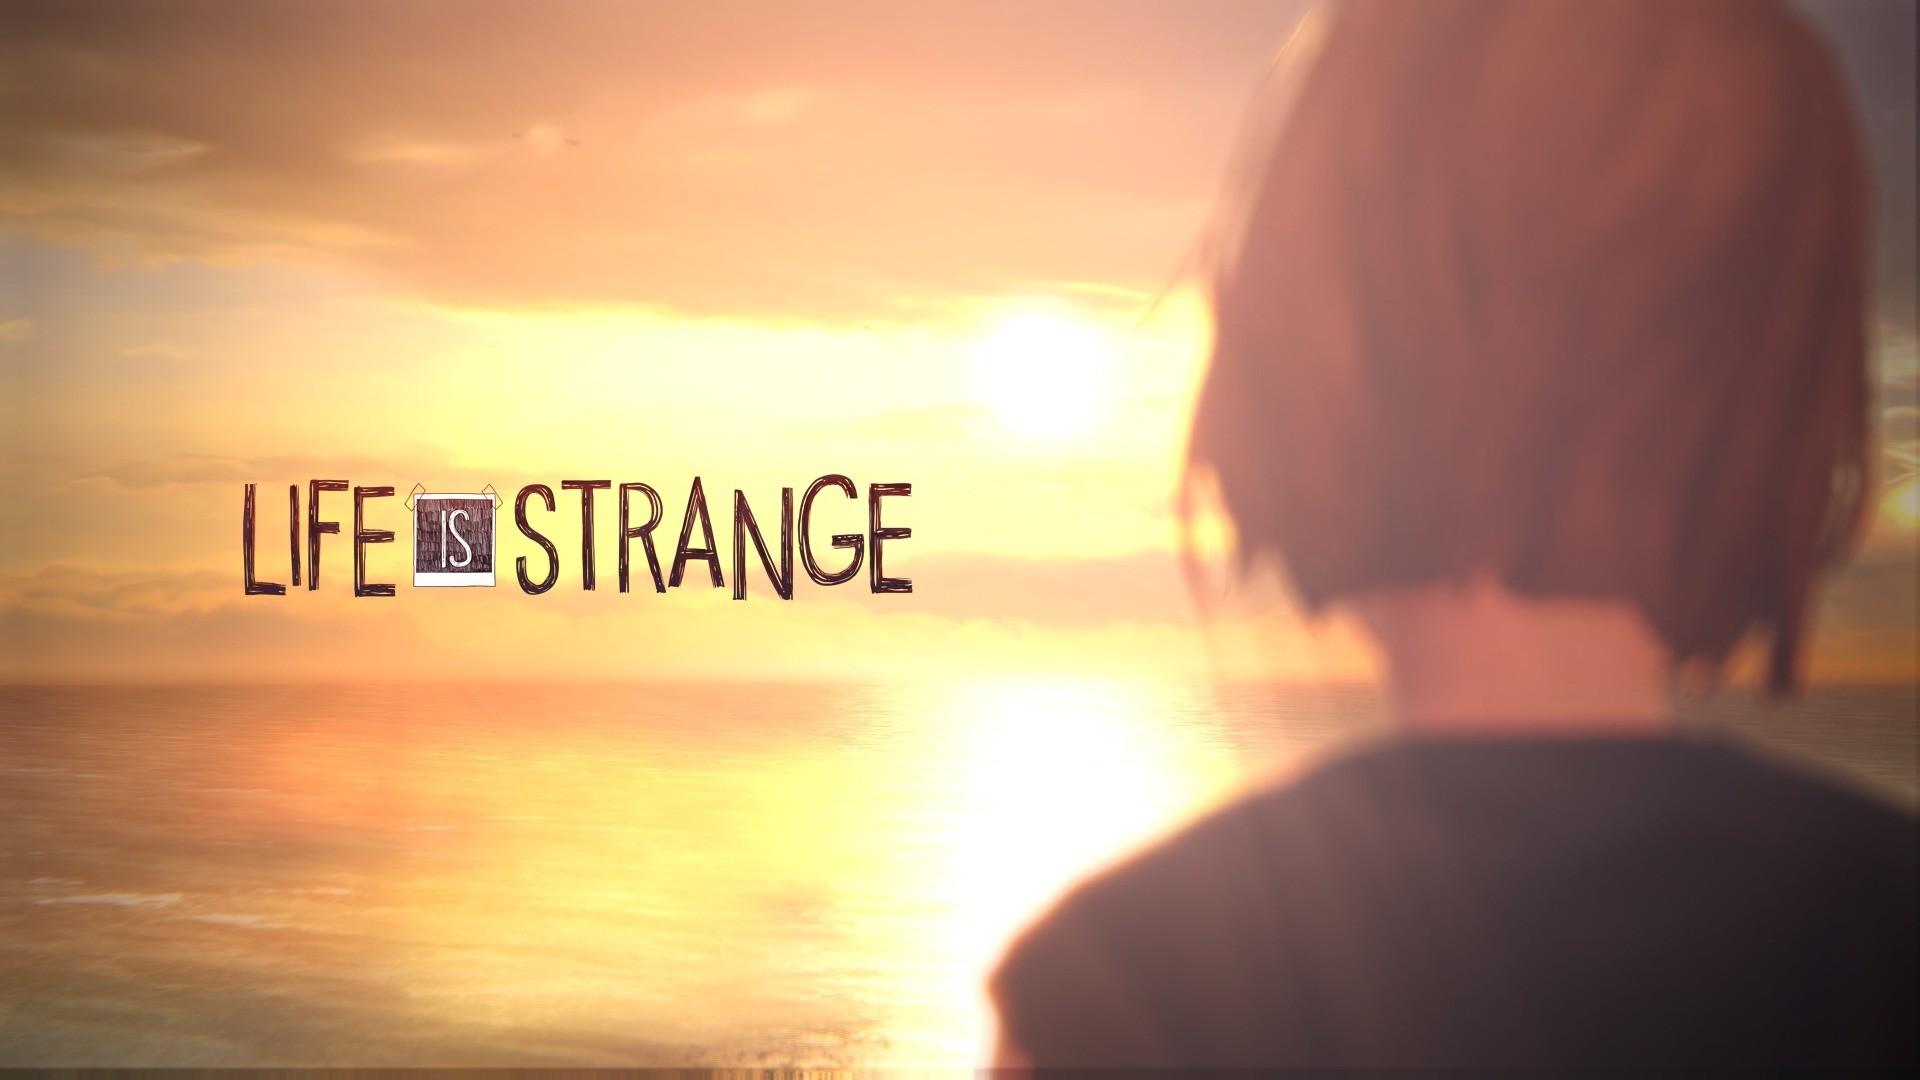 Life Is Strange HD Wallpaper (85+ images)